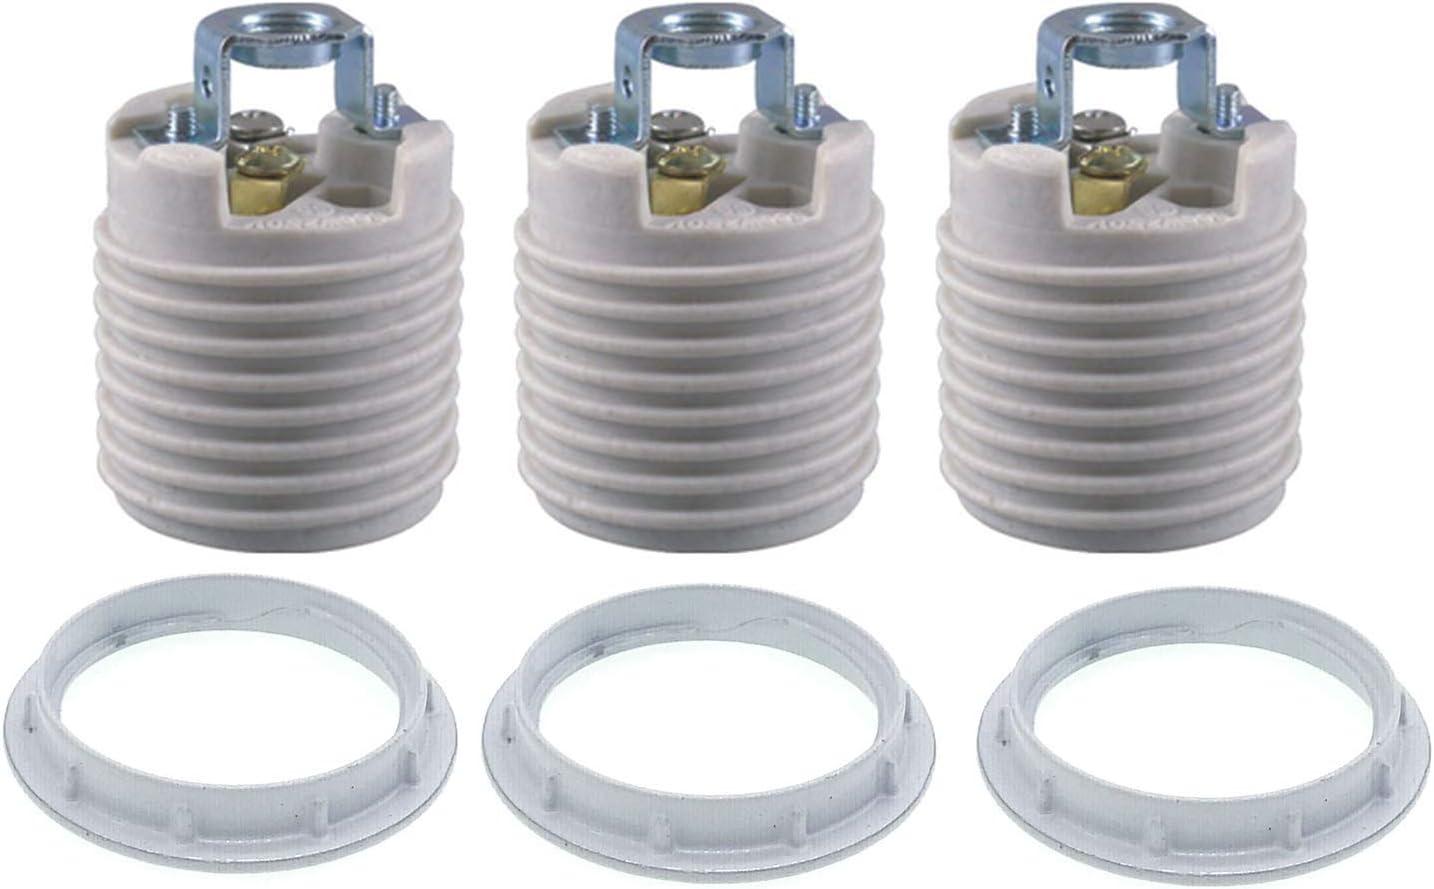 Keyless Porcelain Threaded Socket With Hickey Twdrtdd Medium Base E26 Threaded Keyless Porcelain Lampholder Pack Of 3 Amazon Com